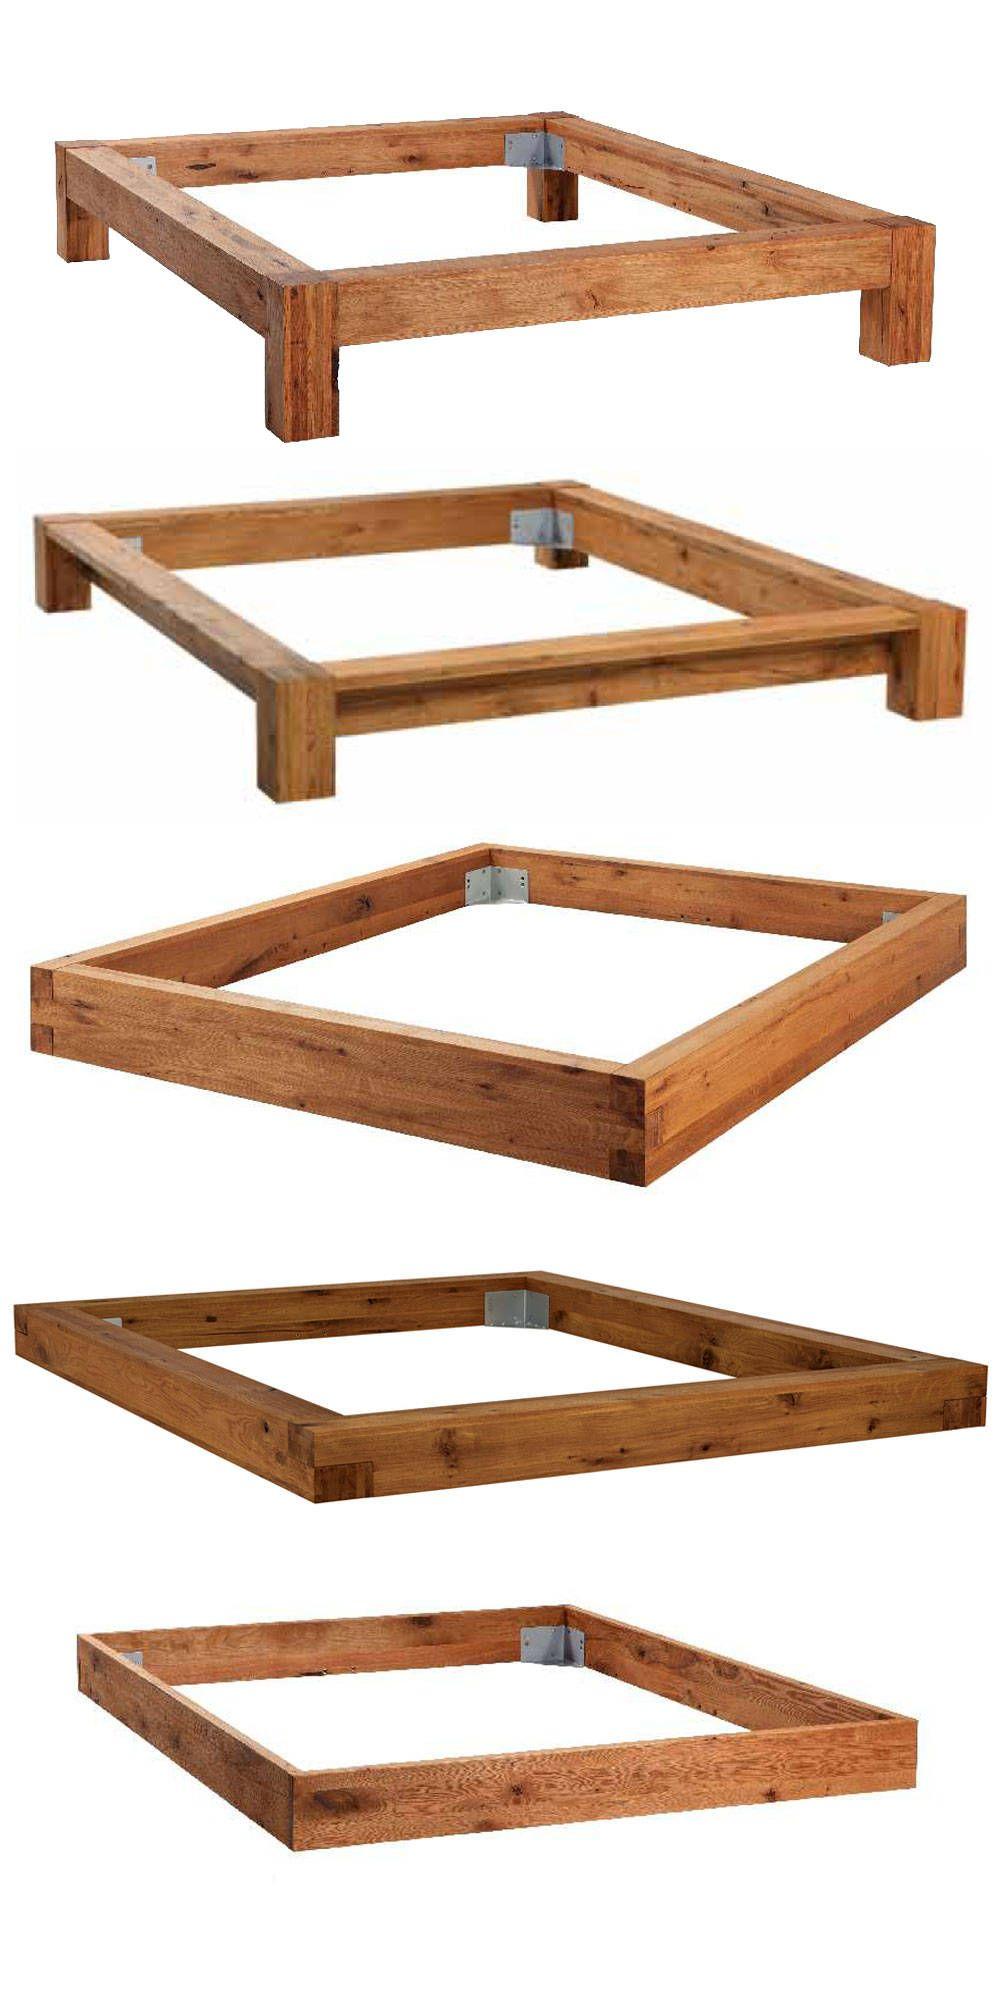 verschiedene Bettrahmen - Oak-Wild Bett | furniture | Pinterest ...